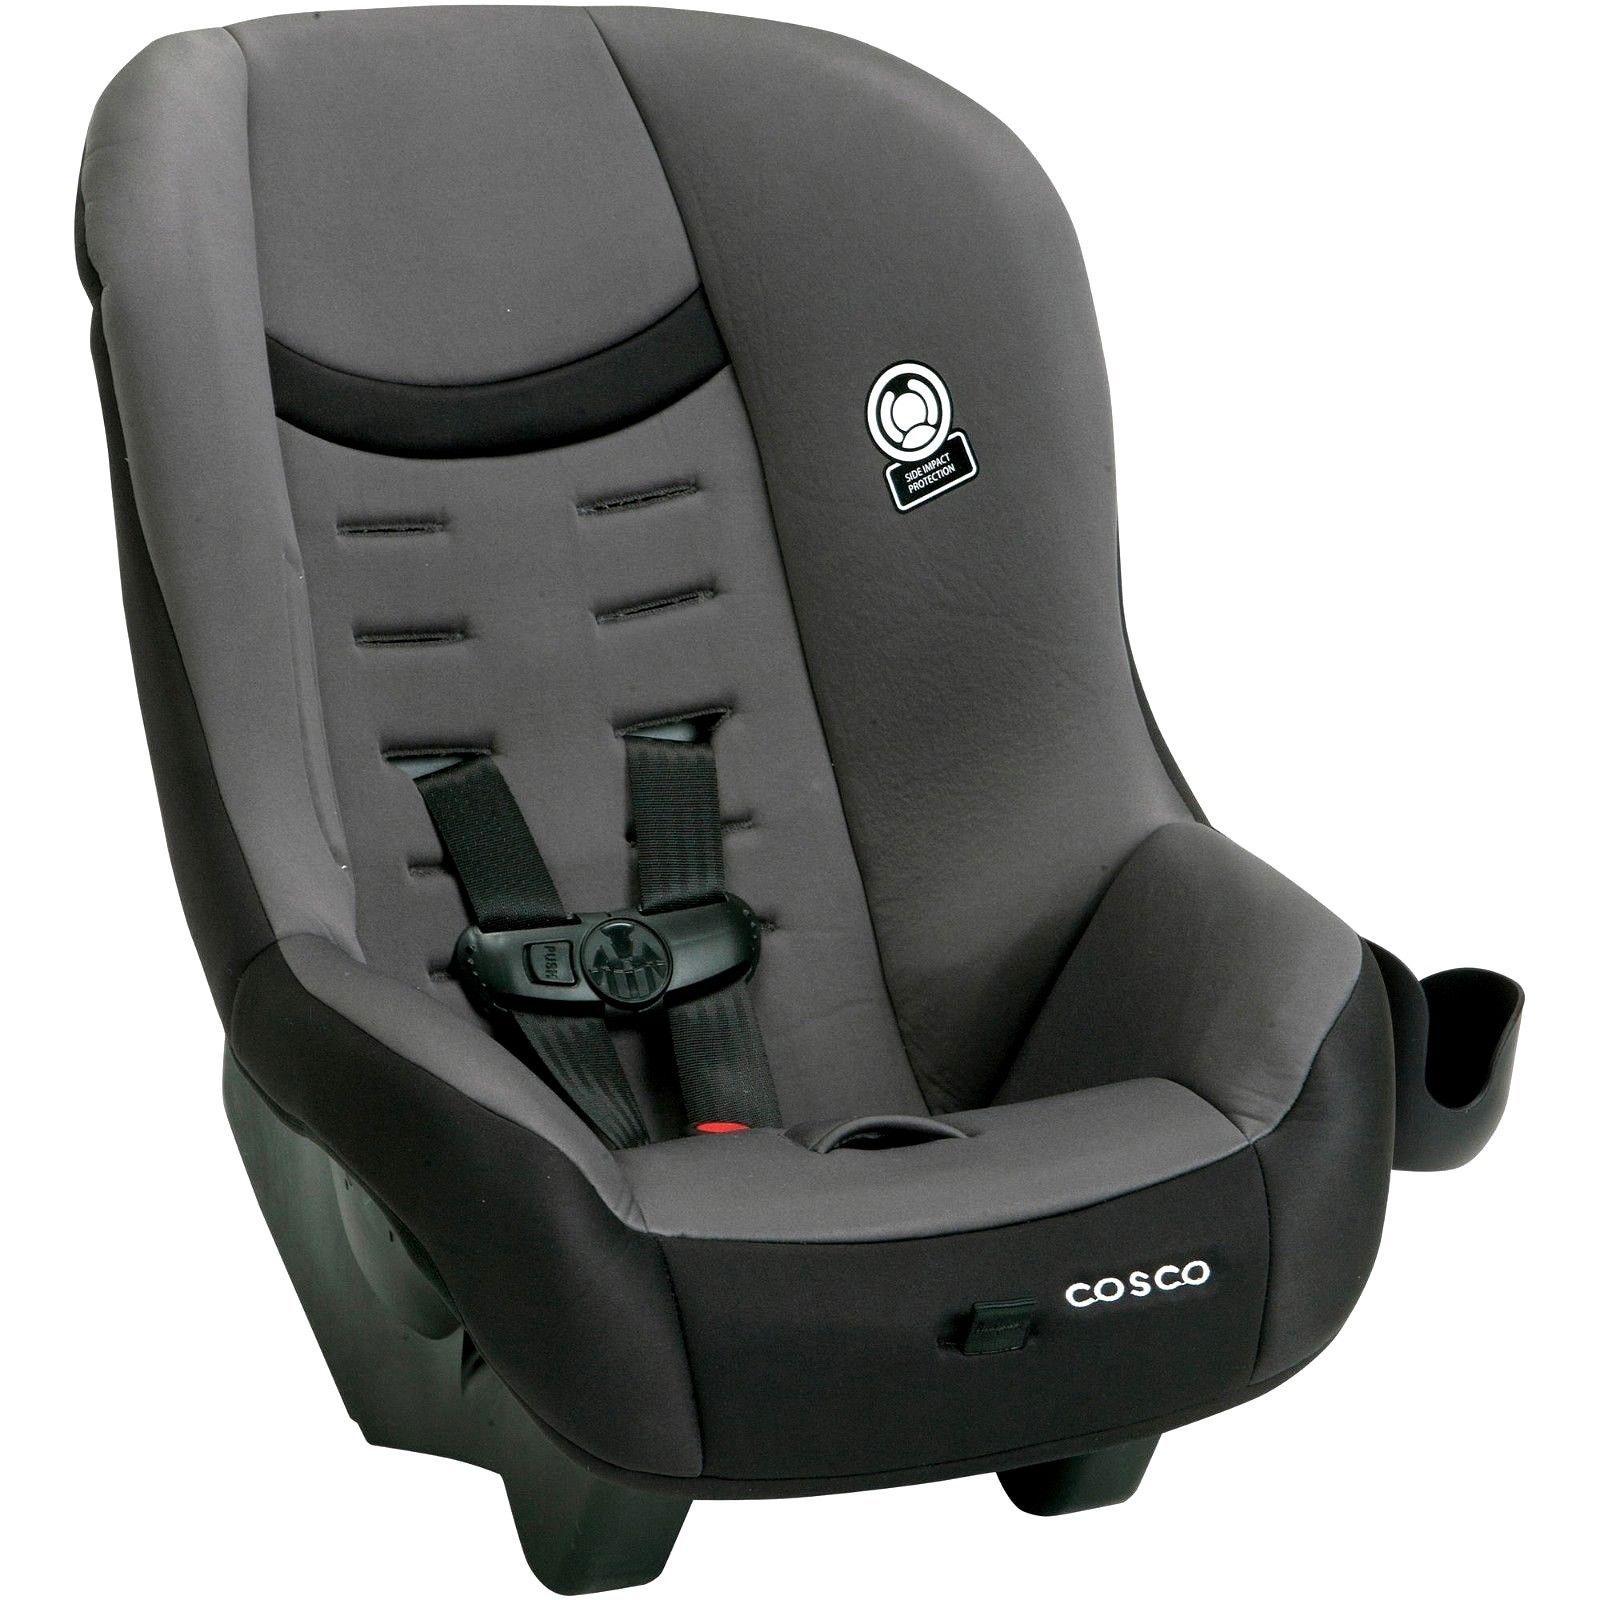 Wondrous Convertible Car Seat Baby Safety Chair Portable Travel Creativecarmelina Interior Chair Design Creativecarmelinacom